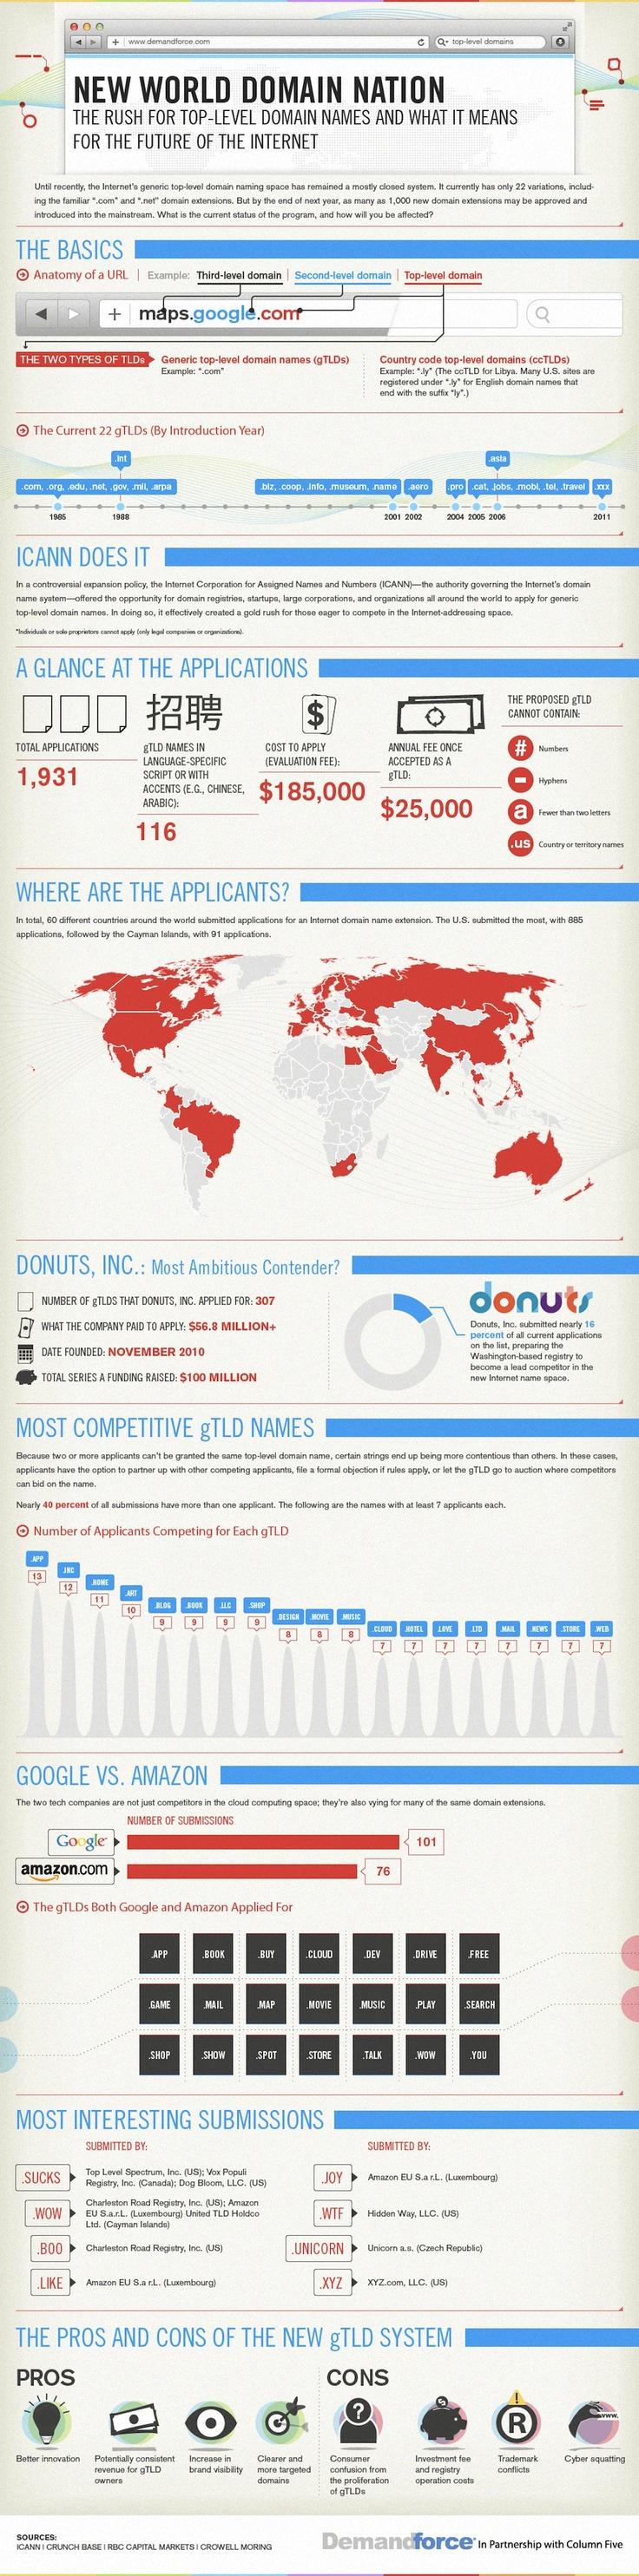 Domain Wars: The Big Money Scramble for New Web Turf